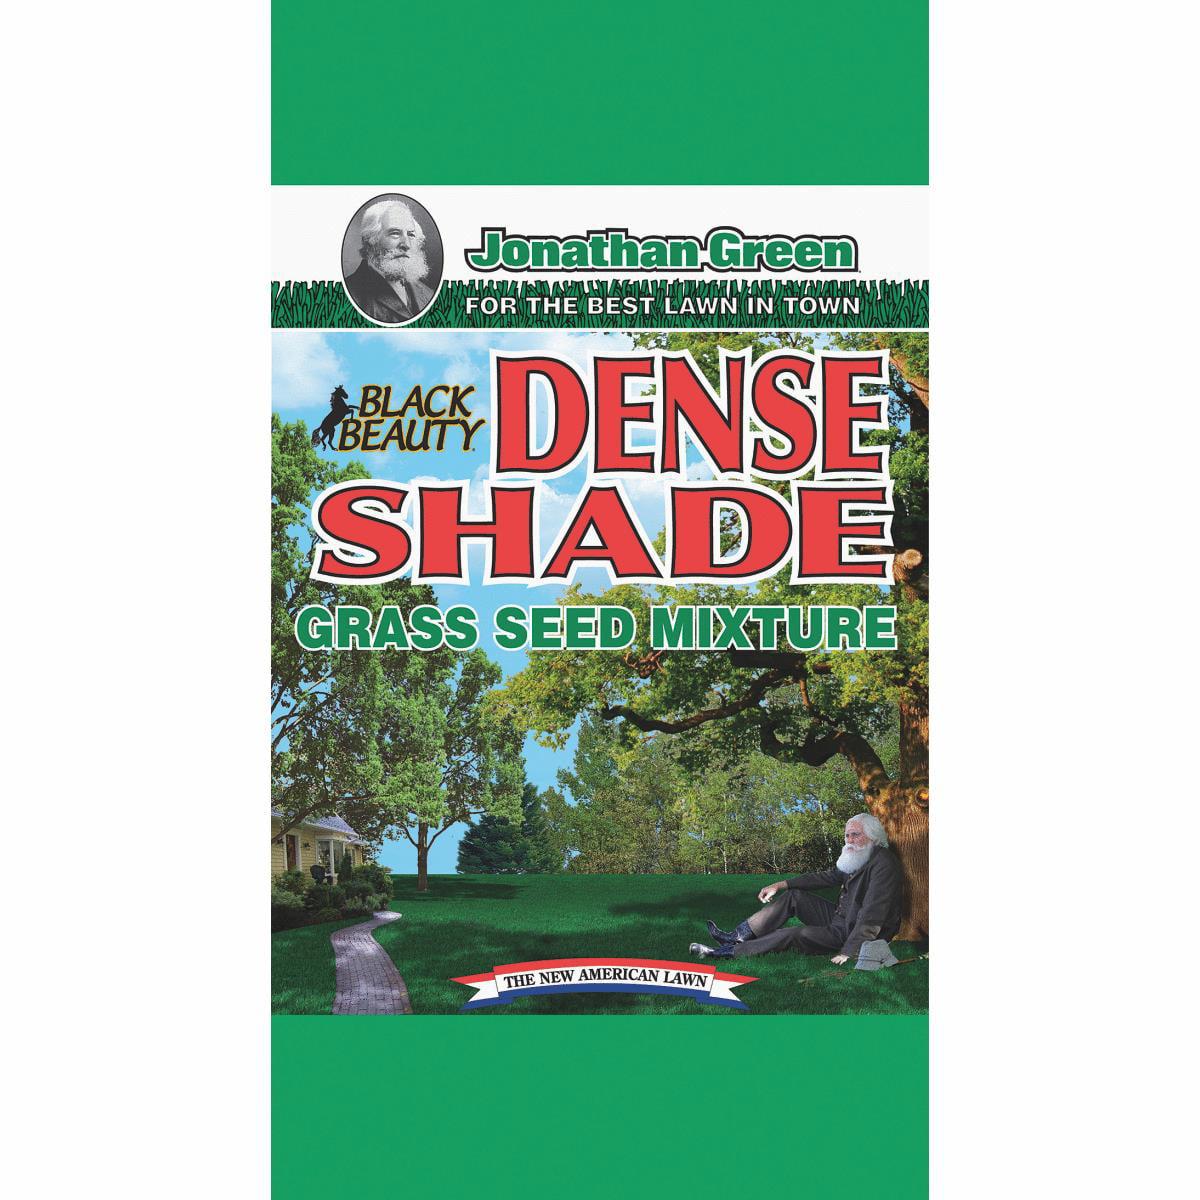 Jonathan Green Dense Shade Grass Seed Mixture